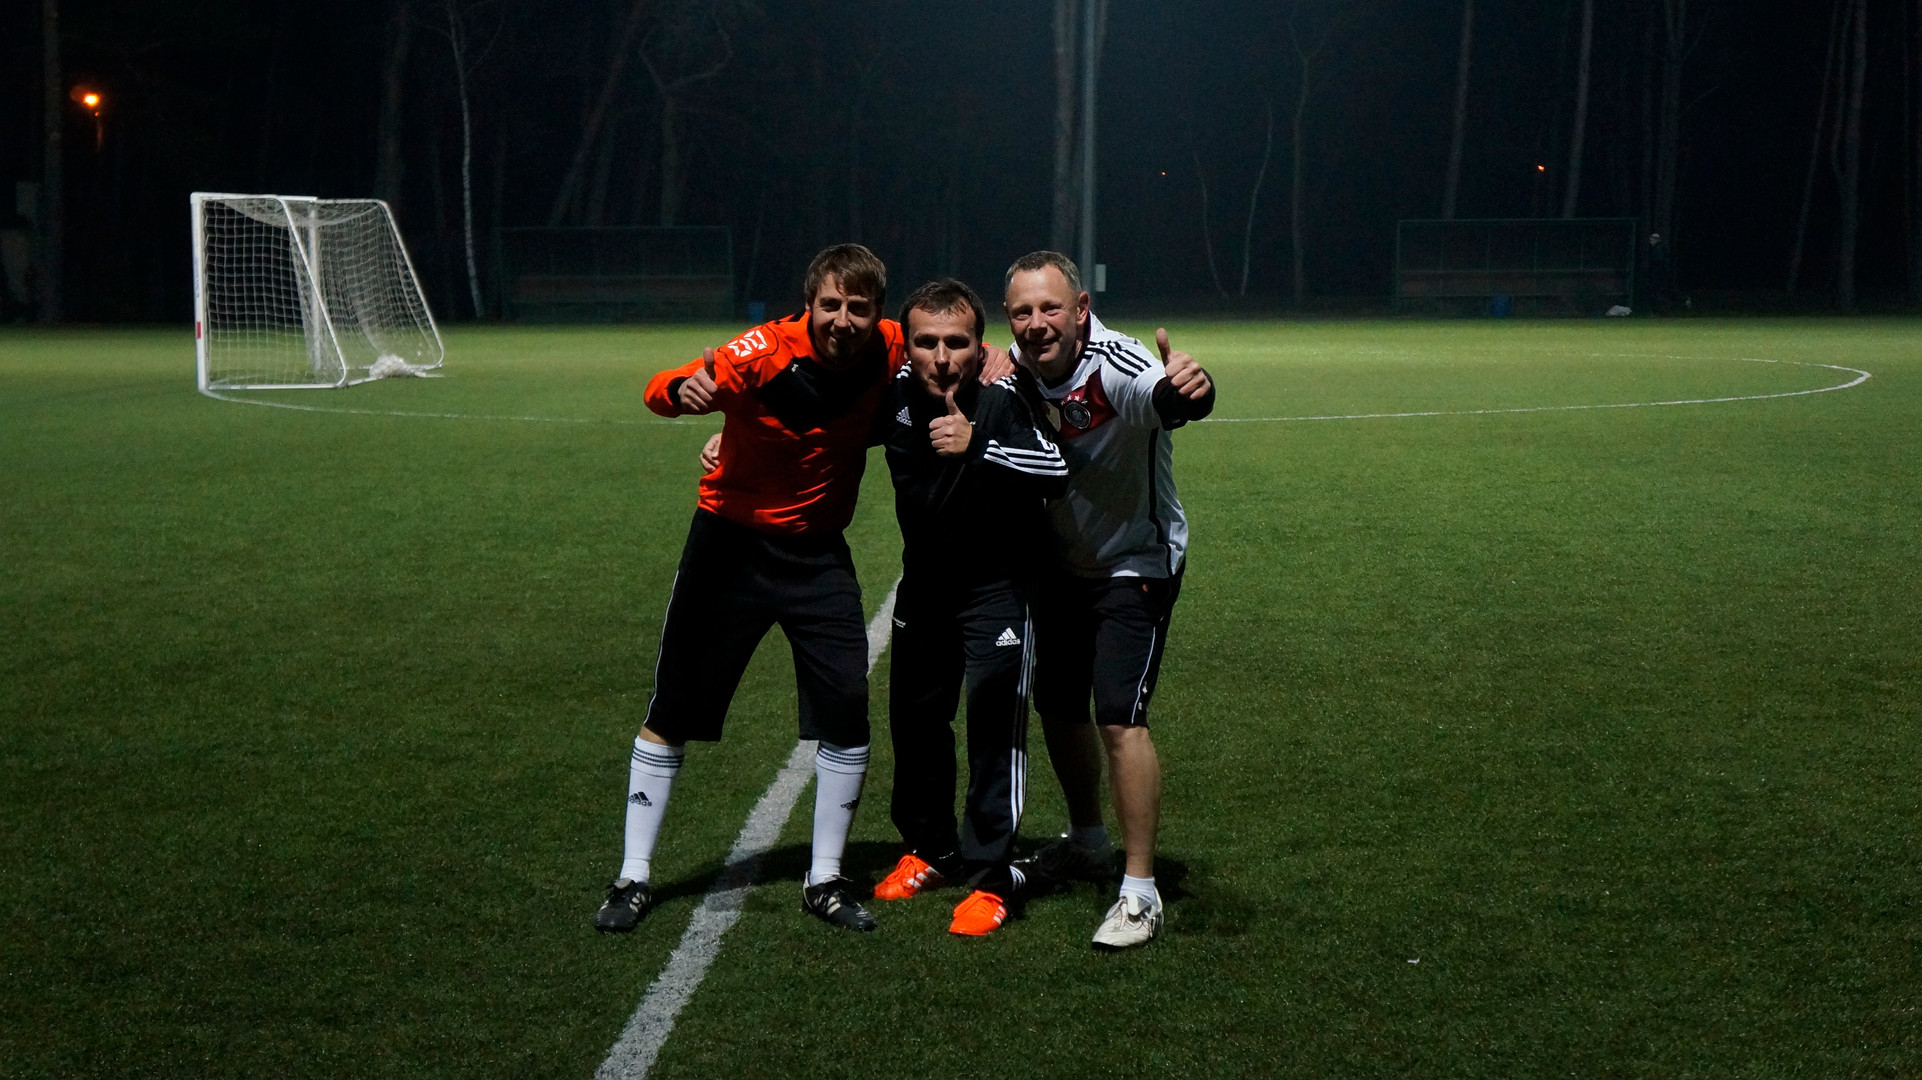 Team in Action-00002.JPG